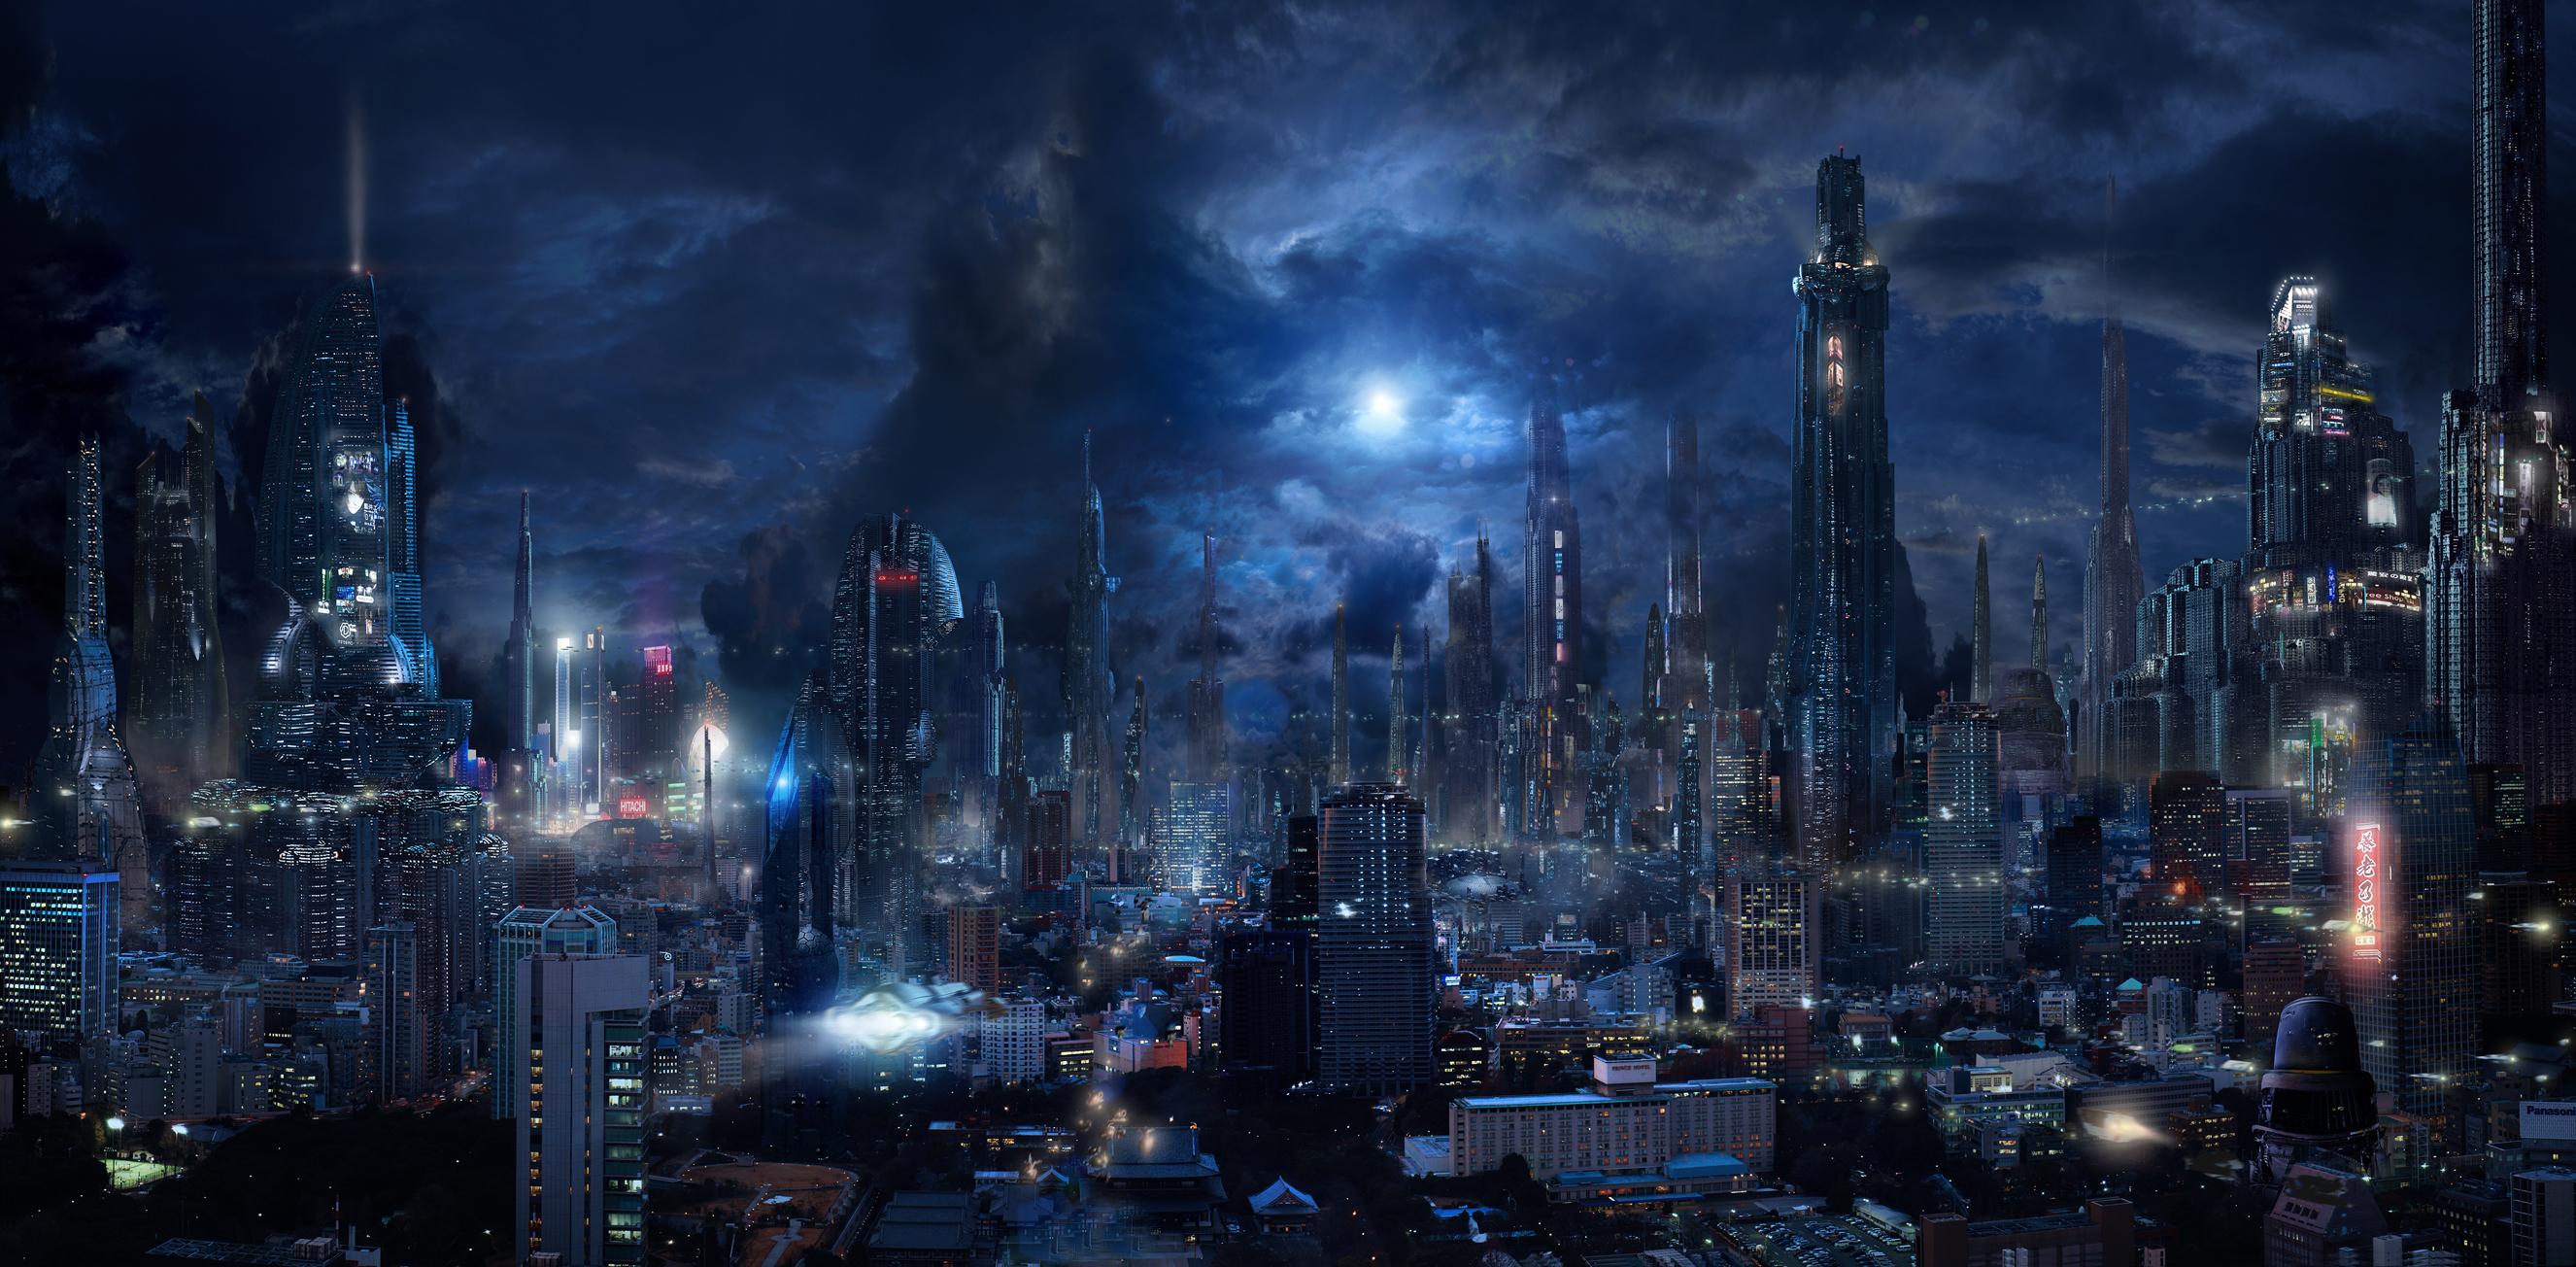 Futuristic City Wallpaper Hd: City HD Wallpaper